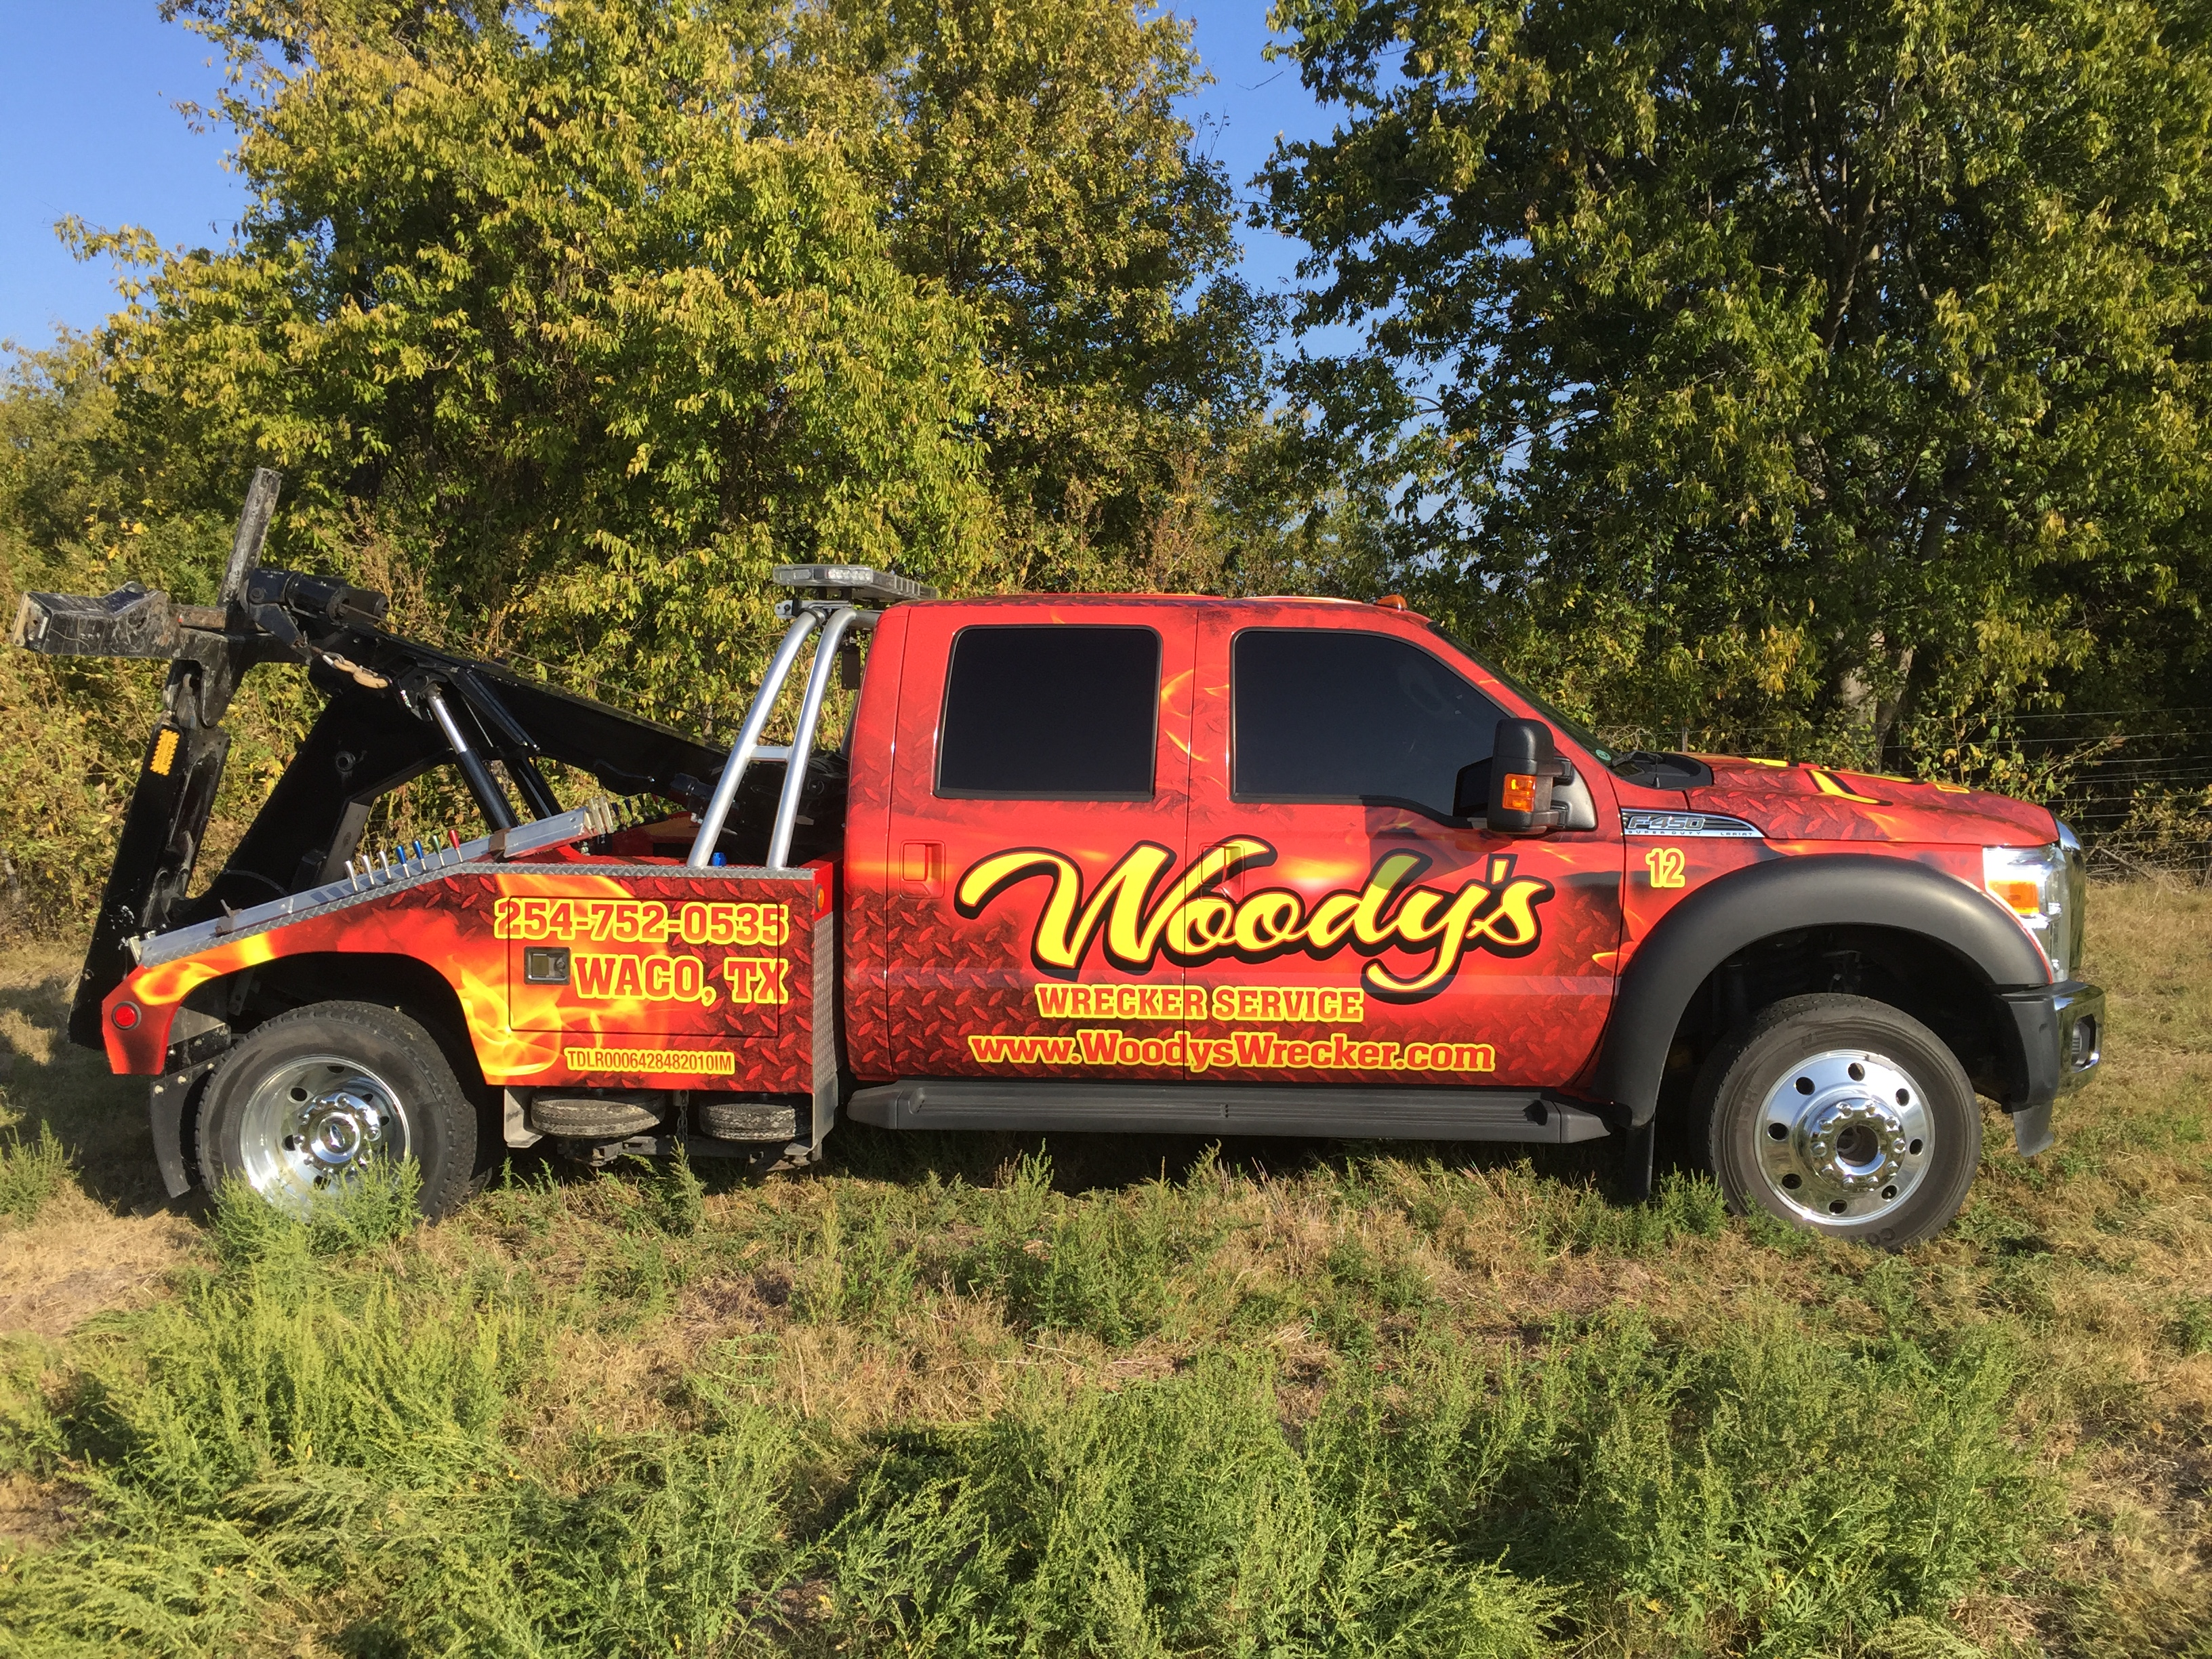 Woody's Wrecker Service, Waco Texas (TX) - LocalDatabase.com